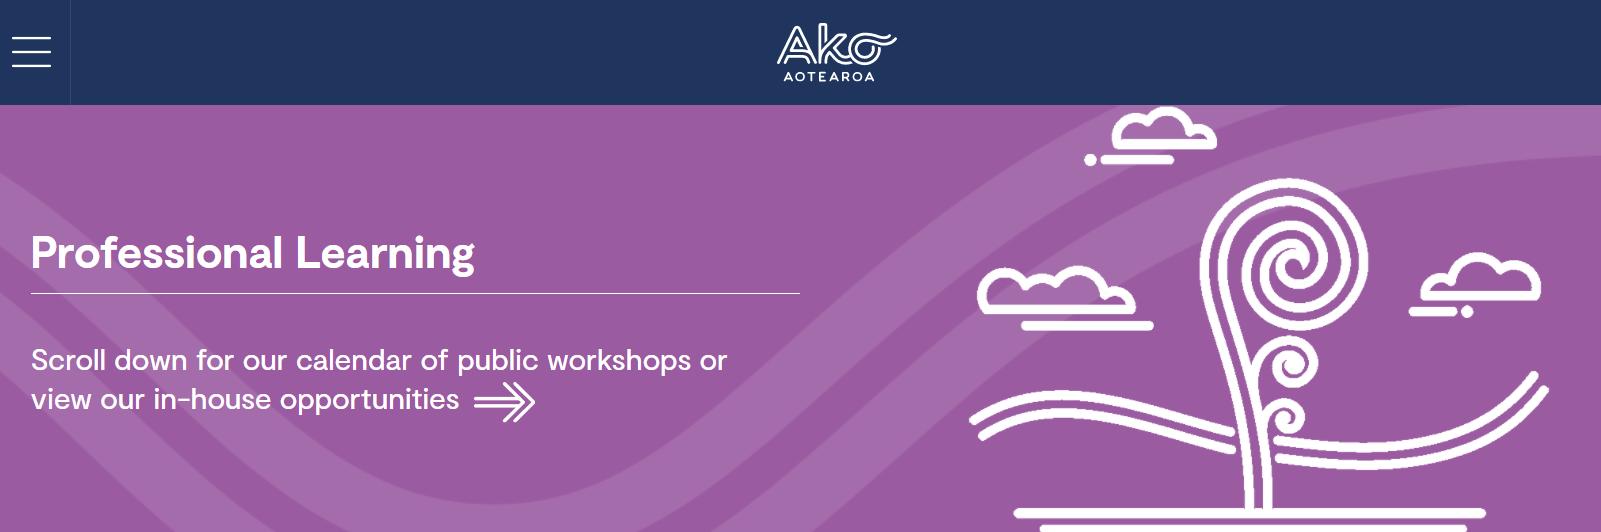 Screenshot from the Ako Aotearoa website.